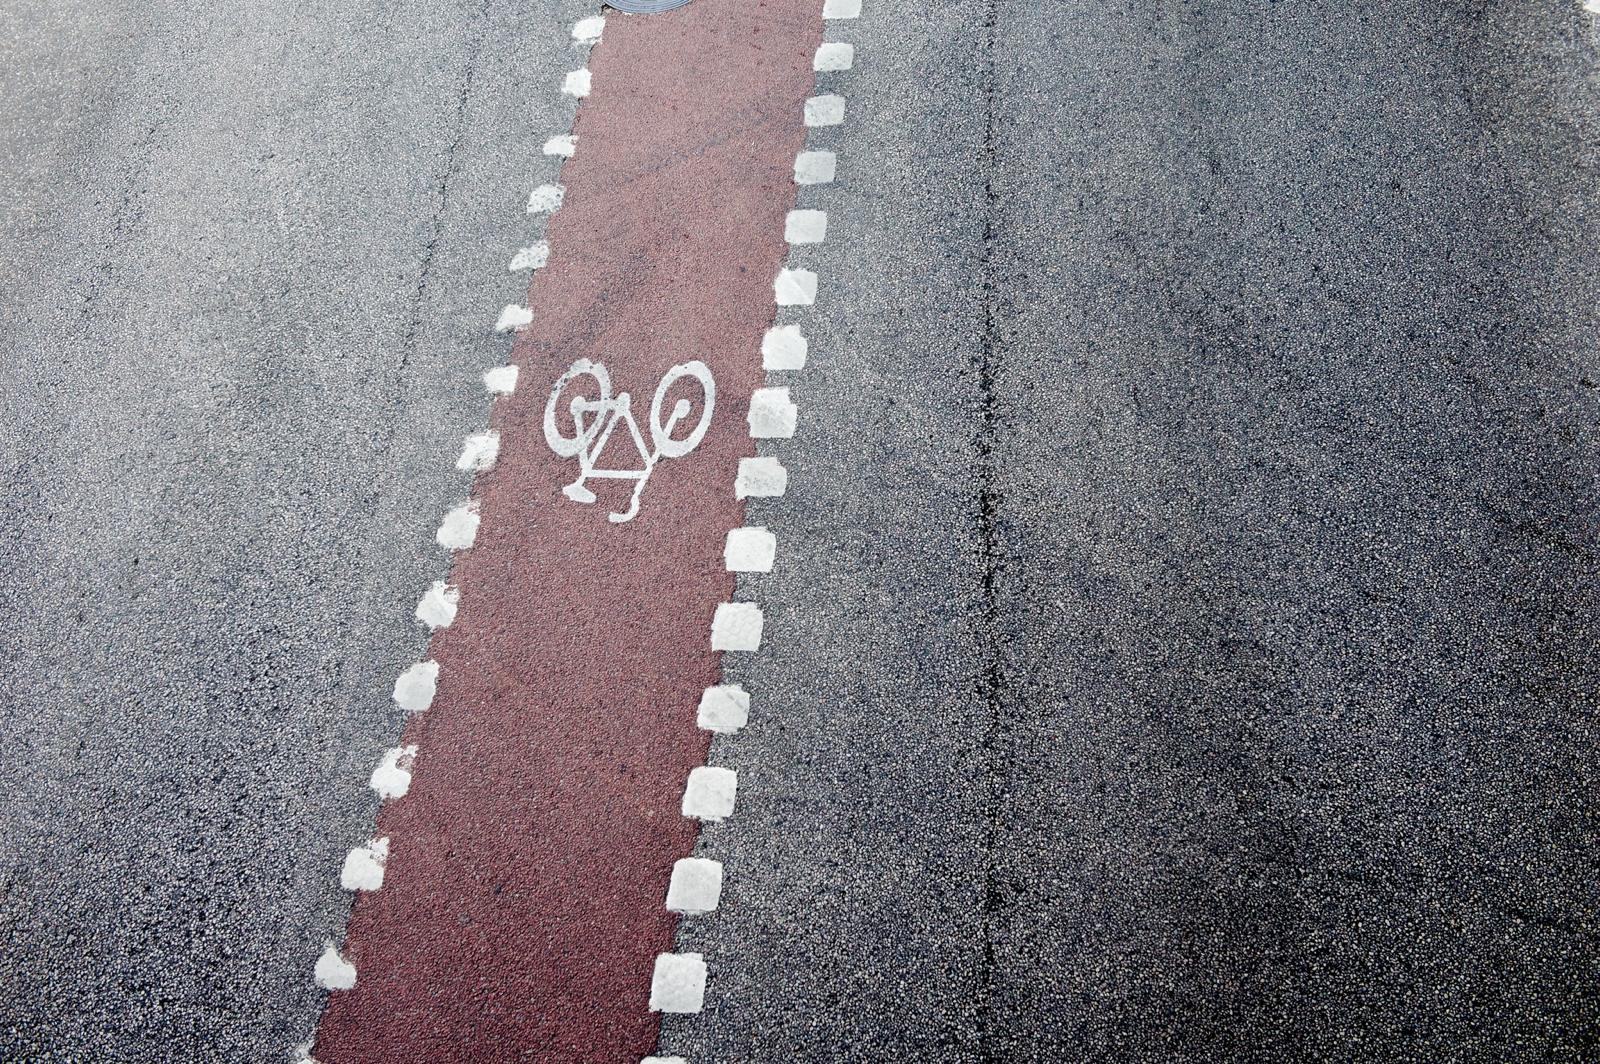 Swedish cycle lane